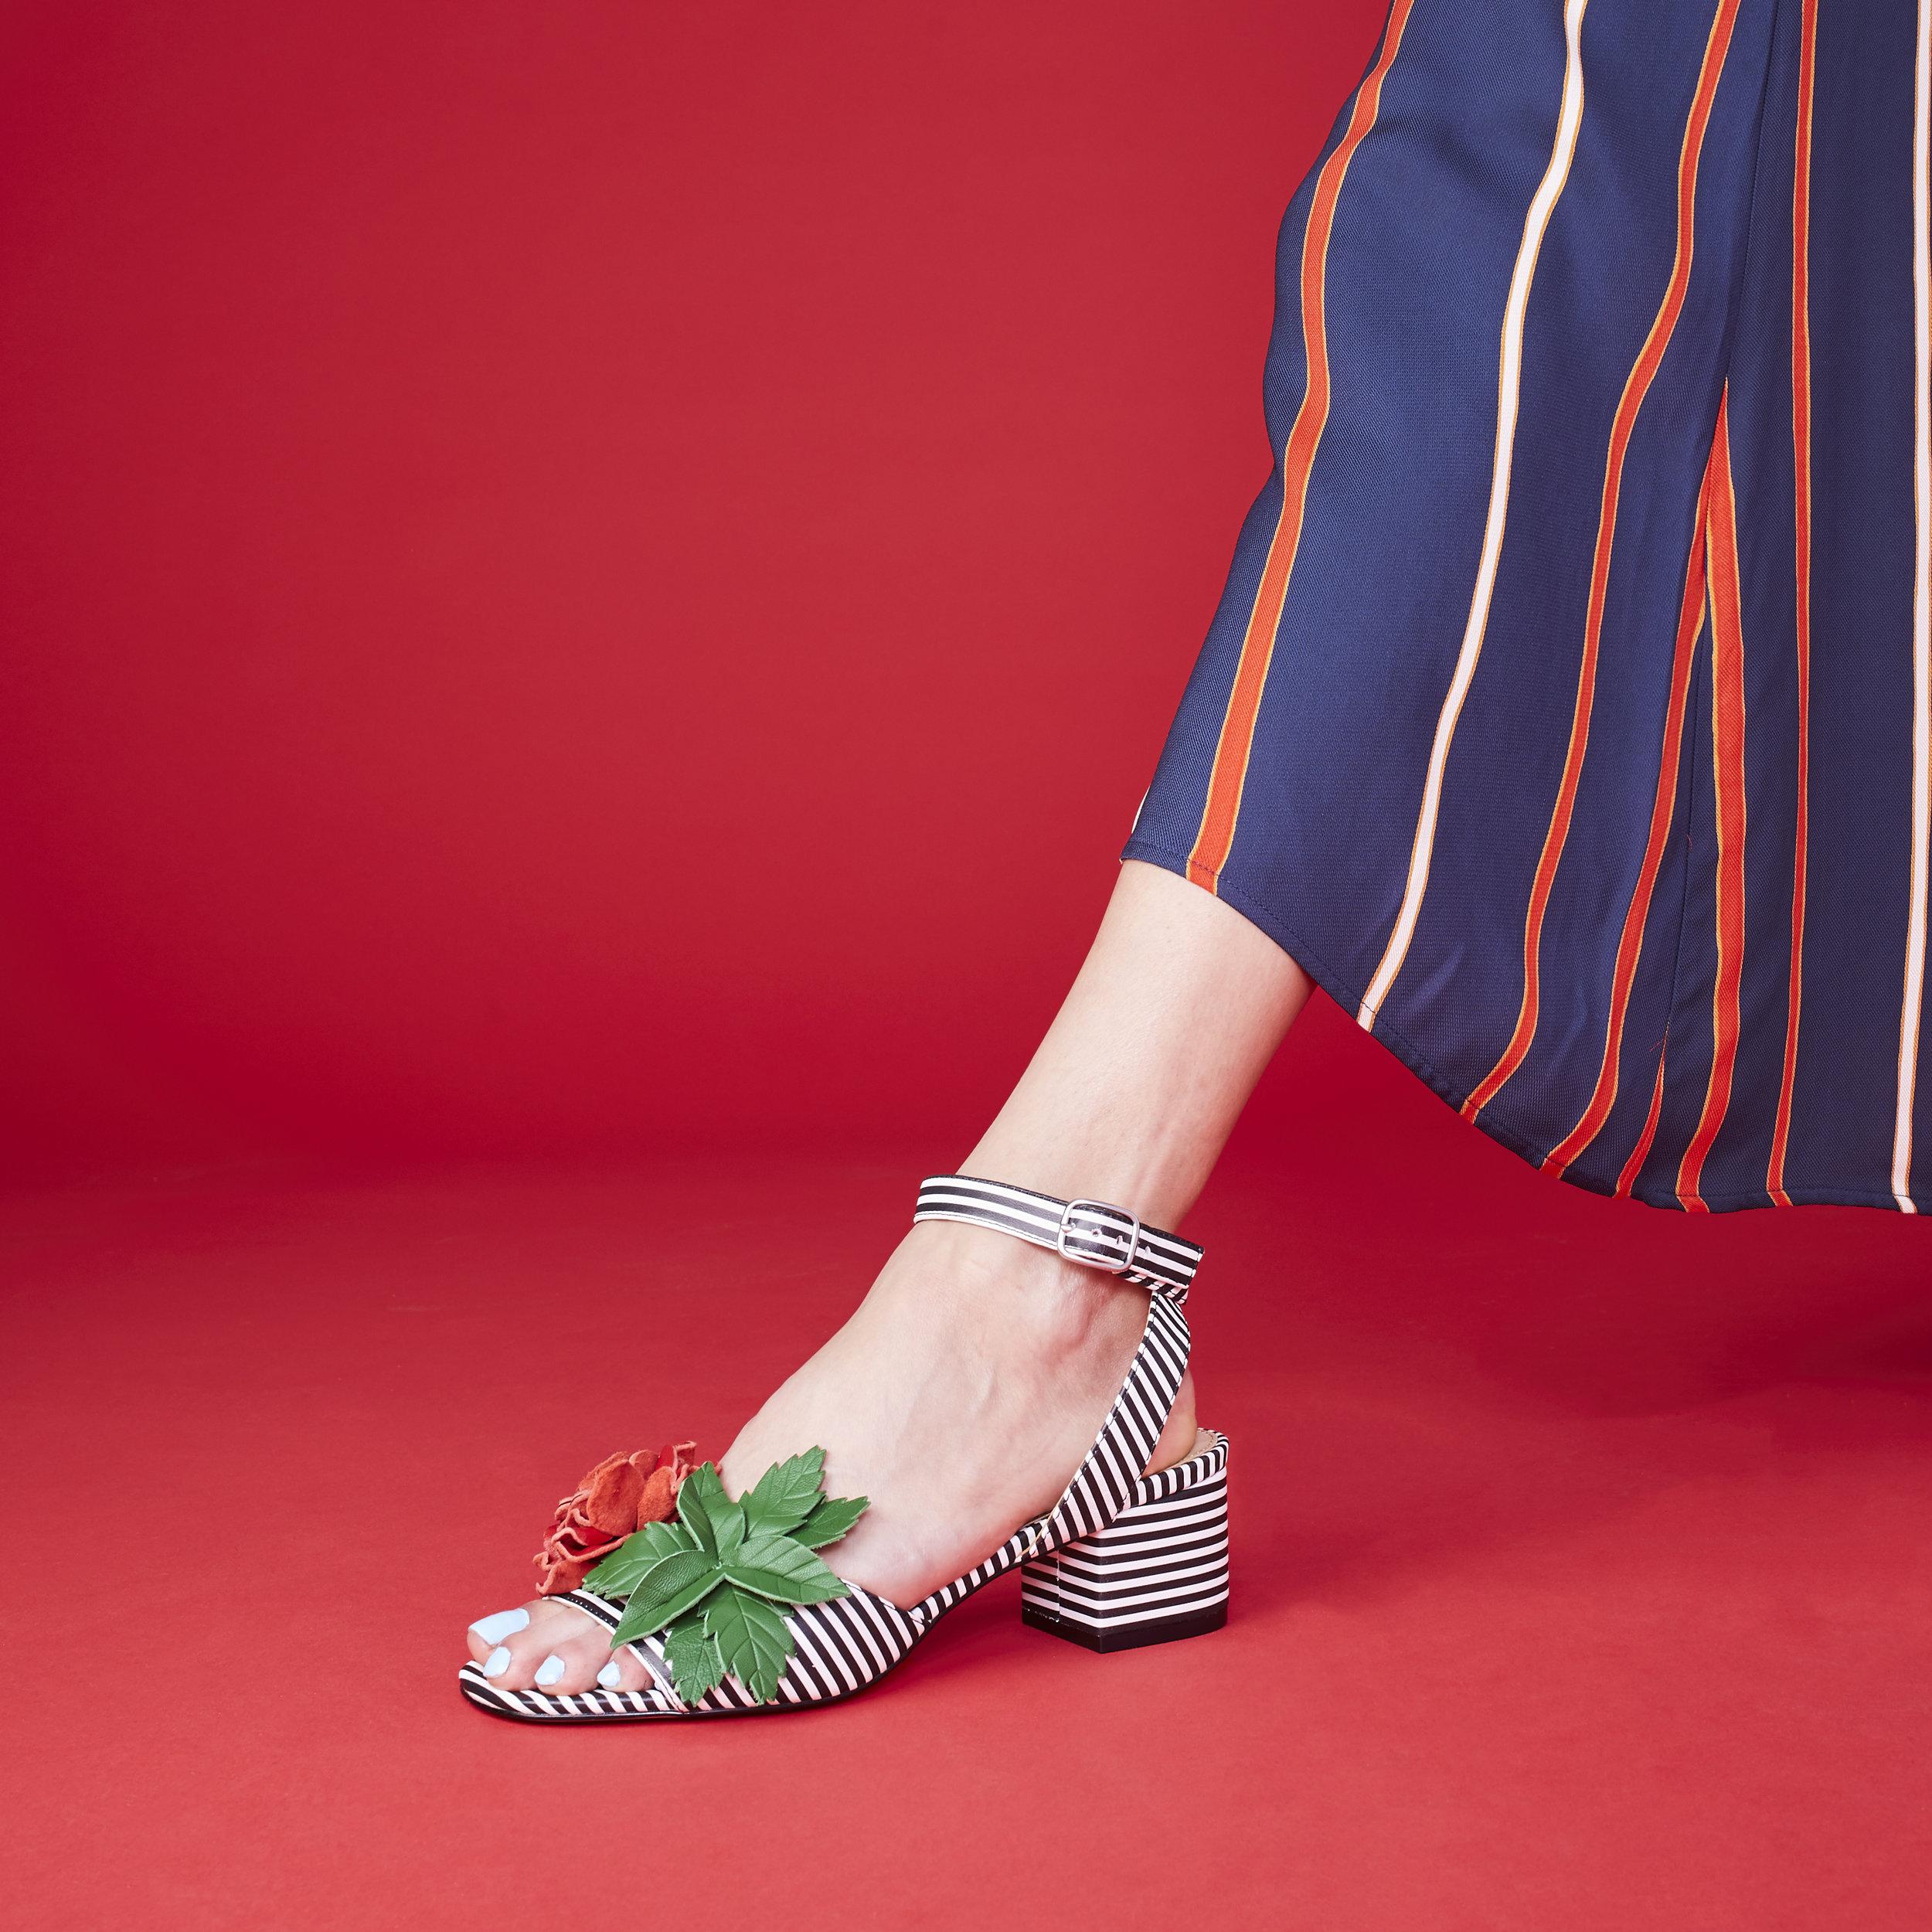 2017-12-08_Katy-Perry-Shoes_Shot 10 Rose Stripe Sandal_015.jpg